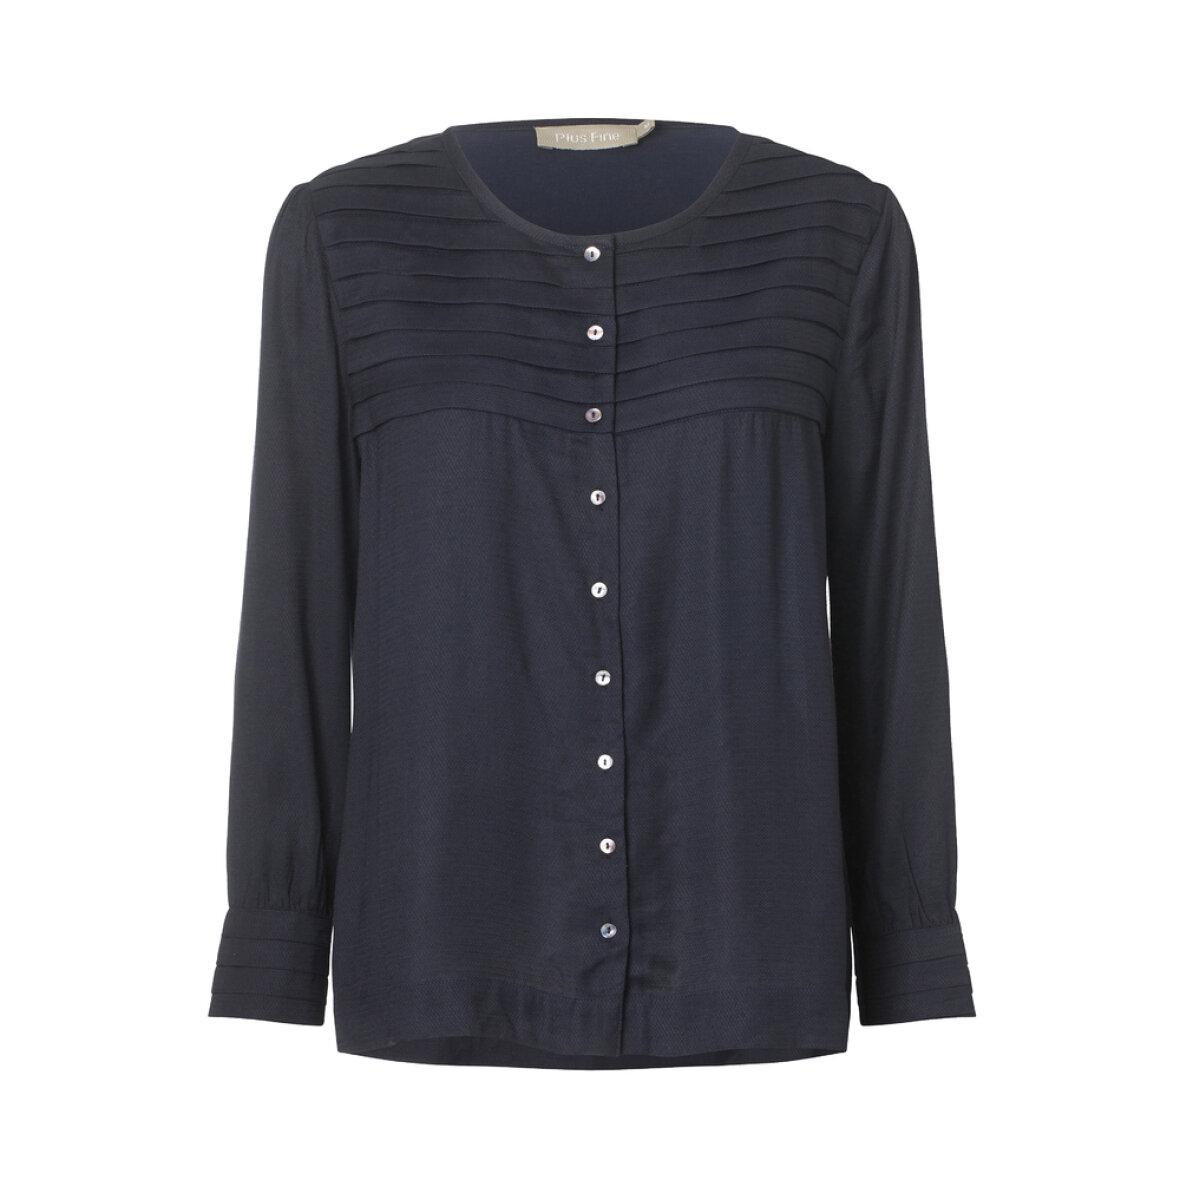 70d910a6d8c4 New York Aabenraa Skjorte D - Fine Cph - Plus Fine Skjorte Kitti navy